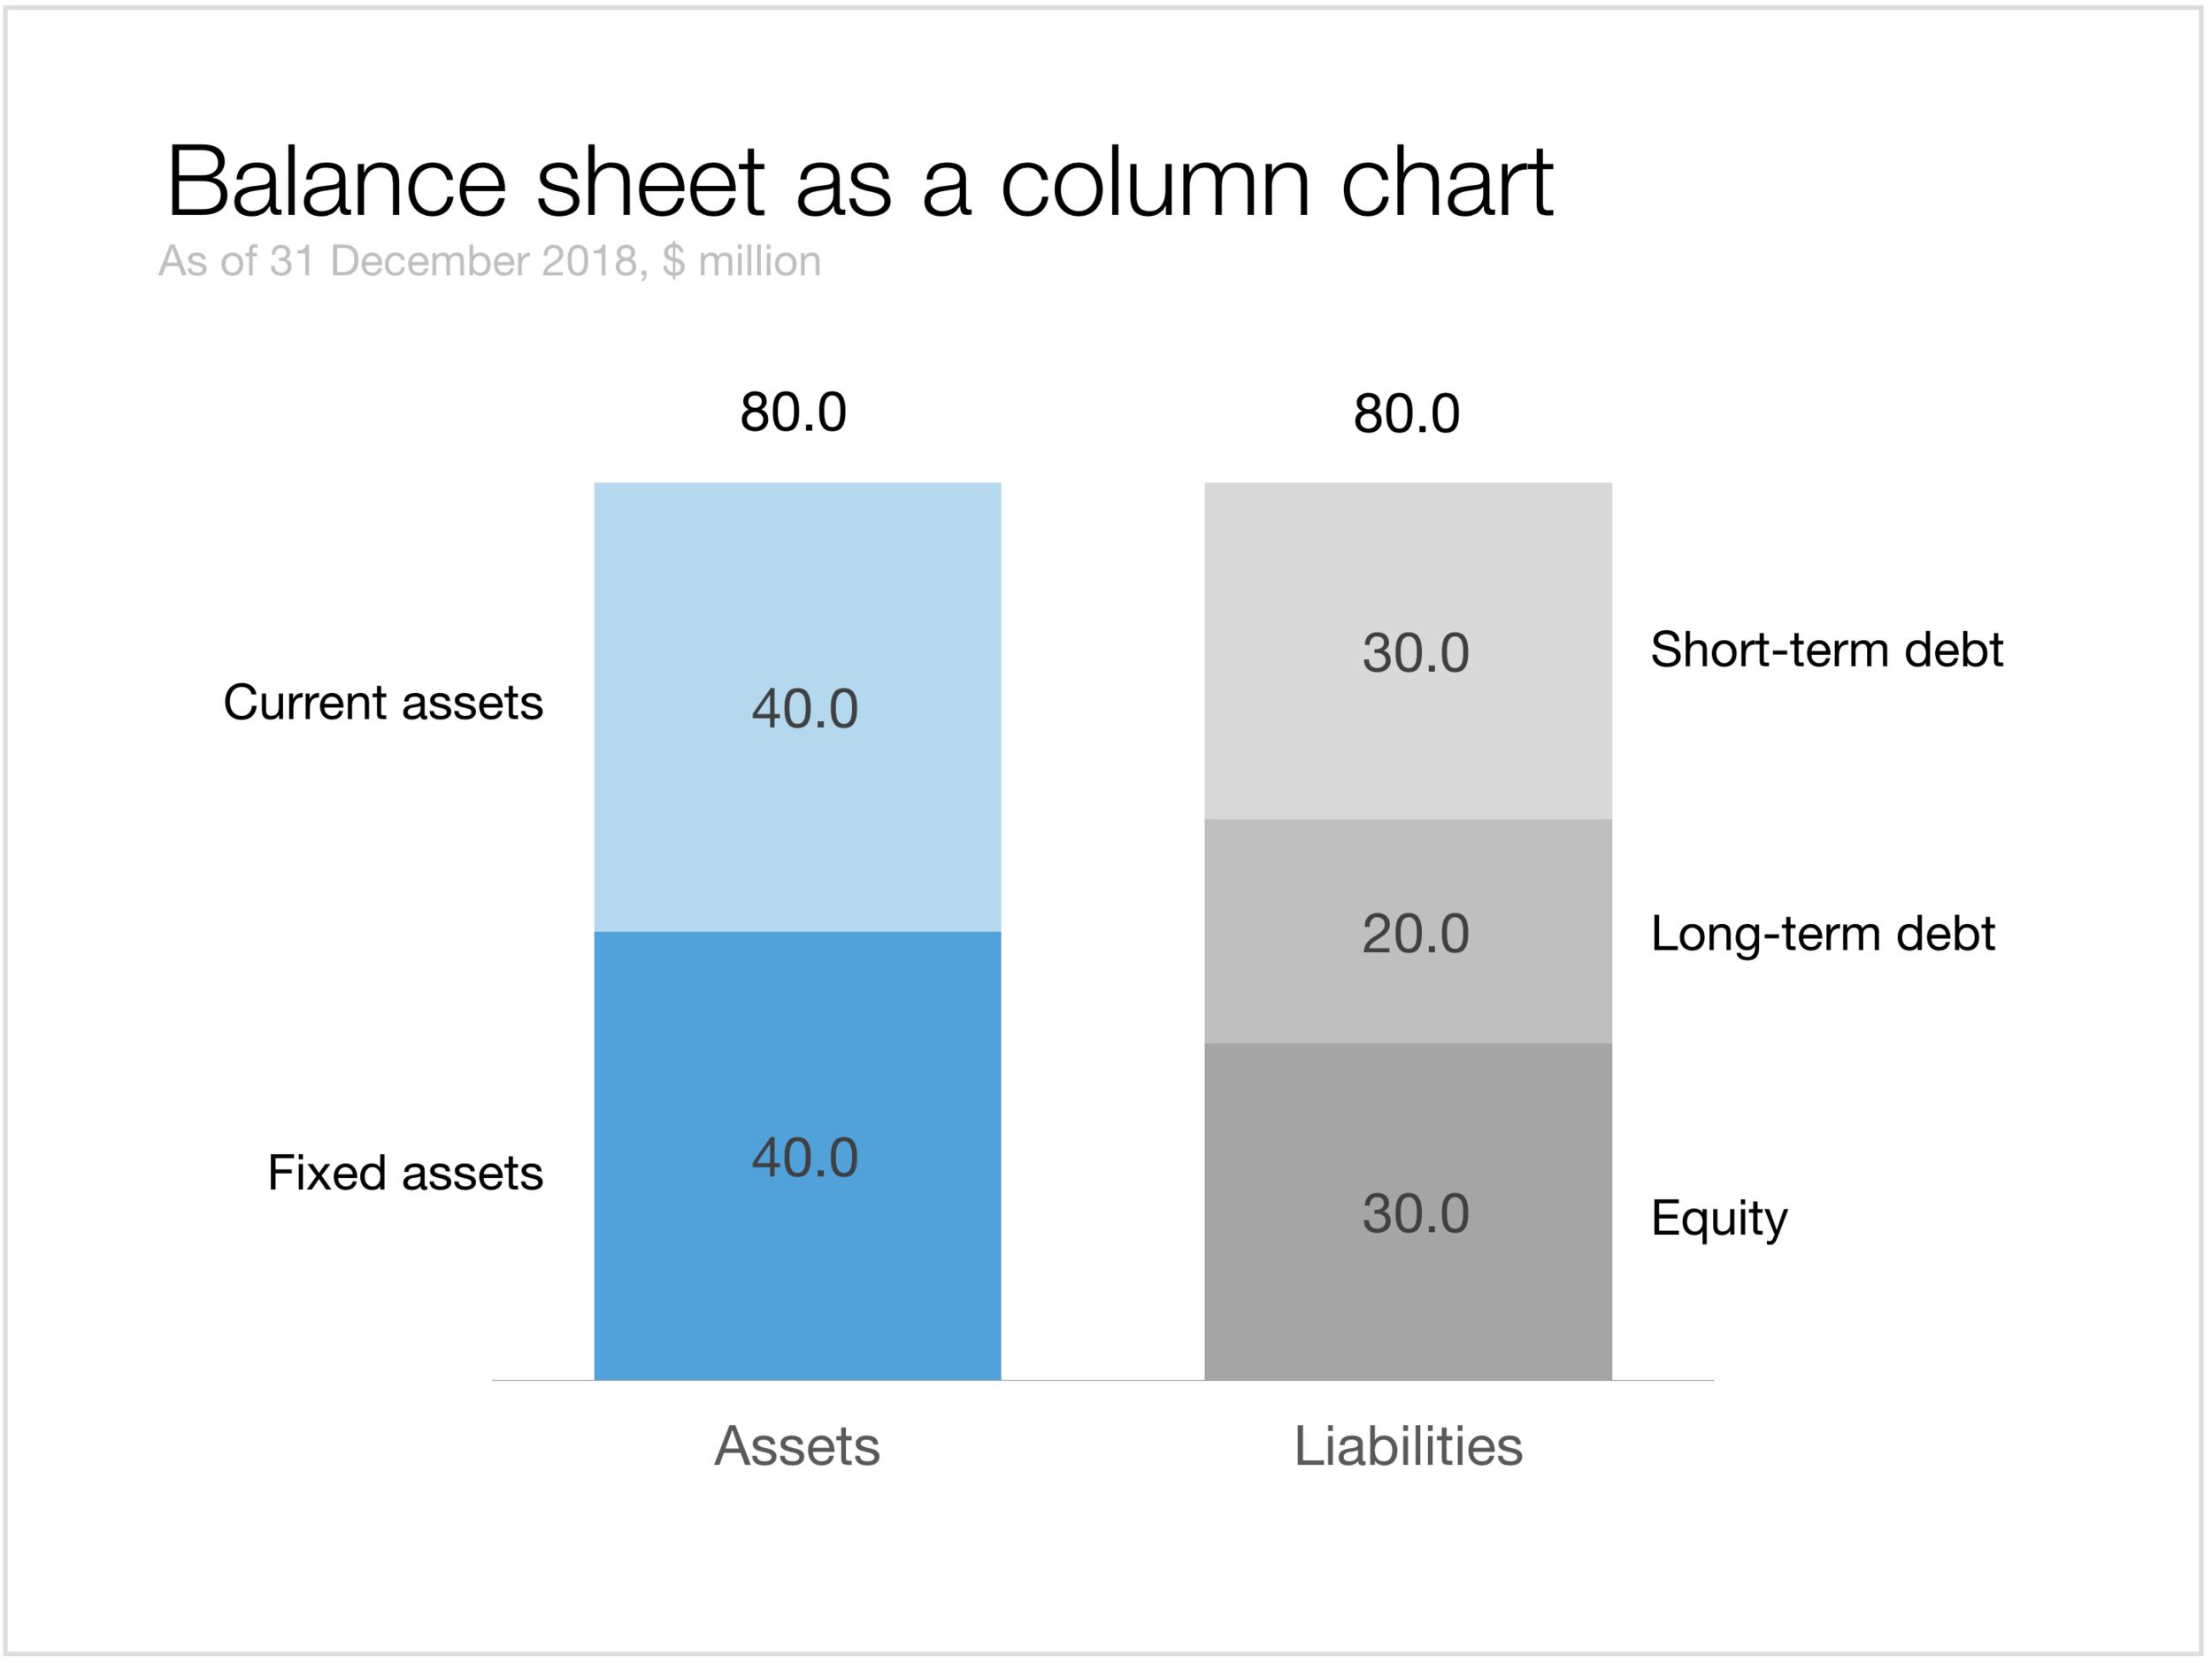 241K - Balance sheet as a column chart in Keynote.png